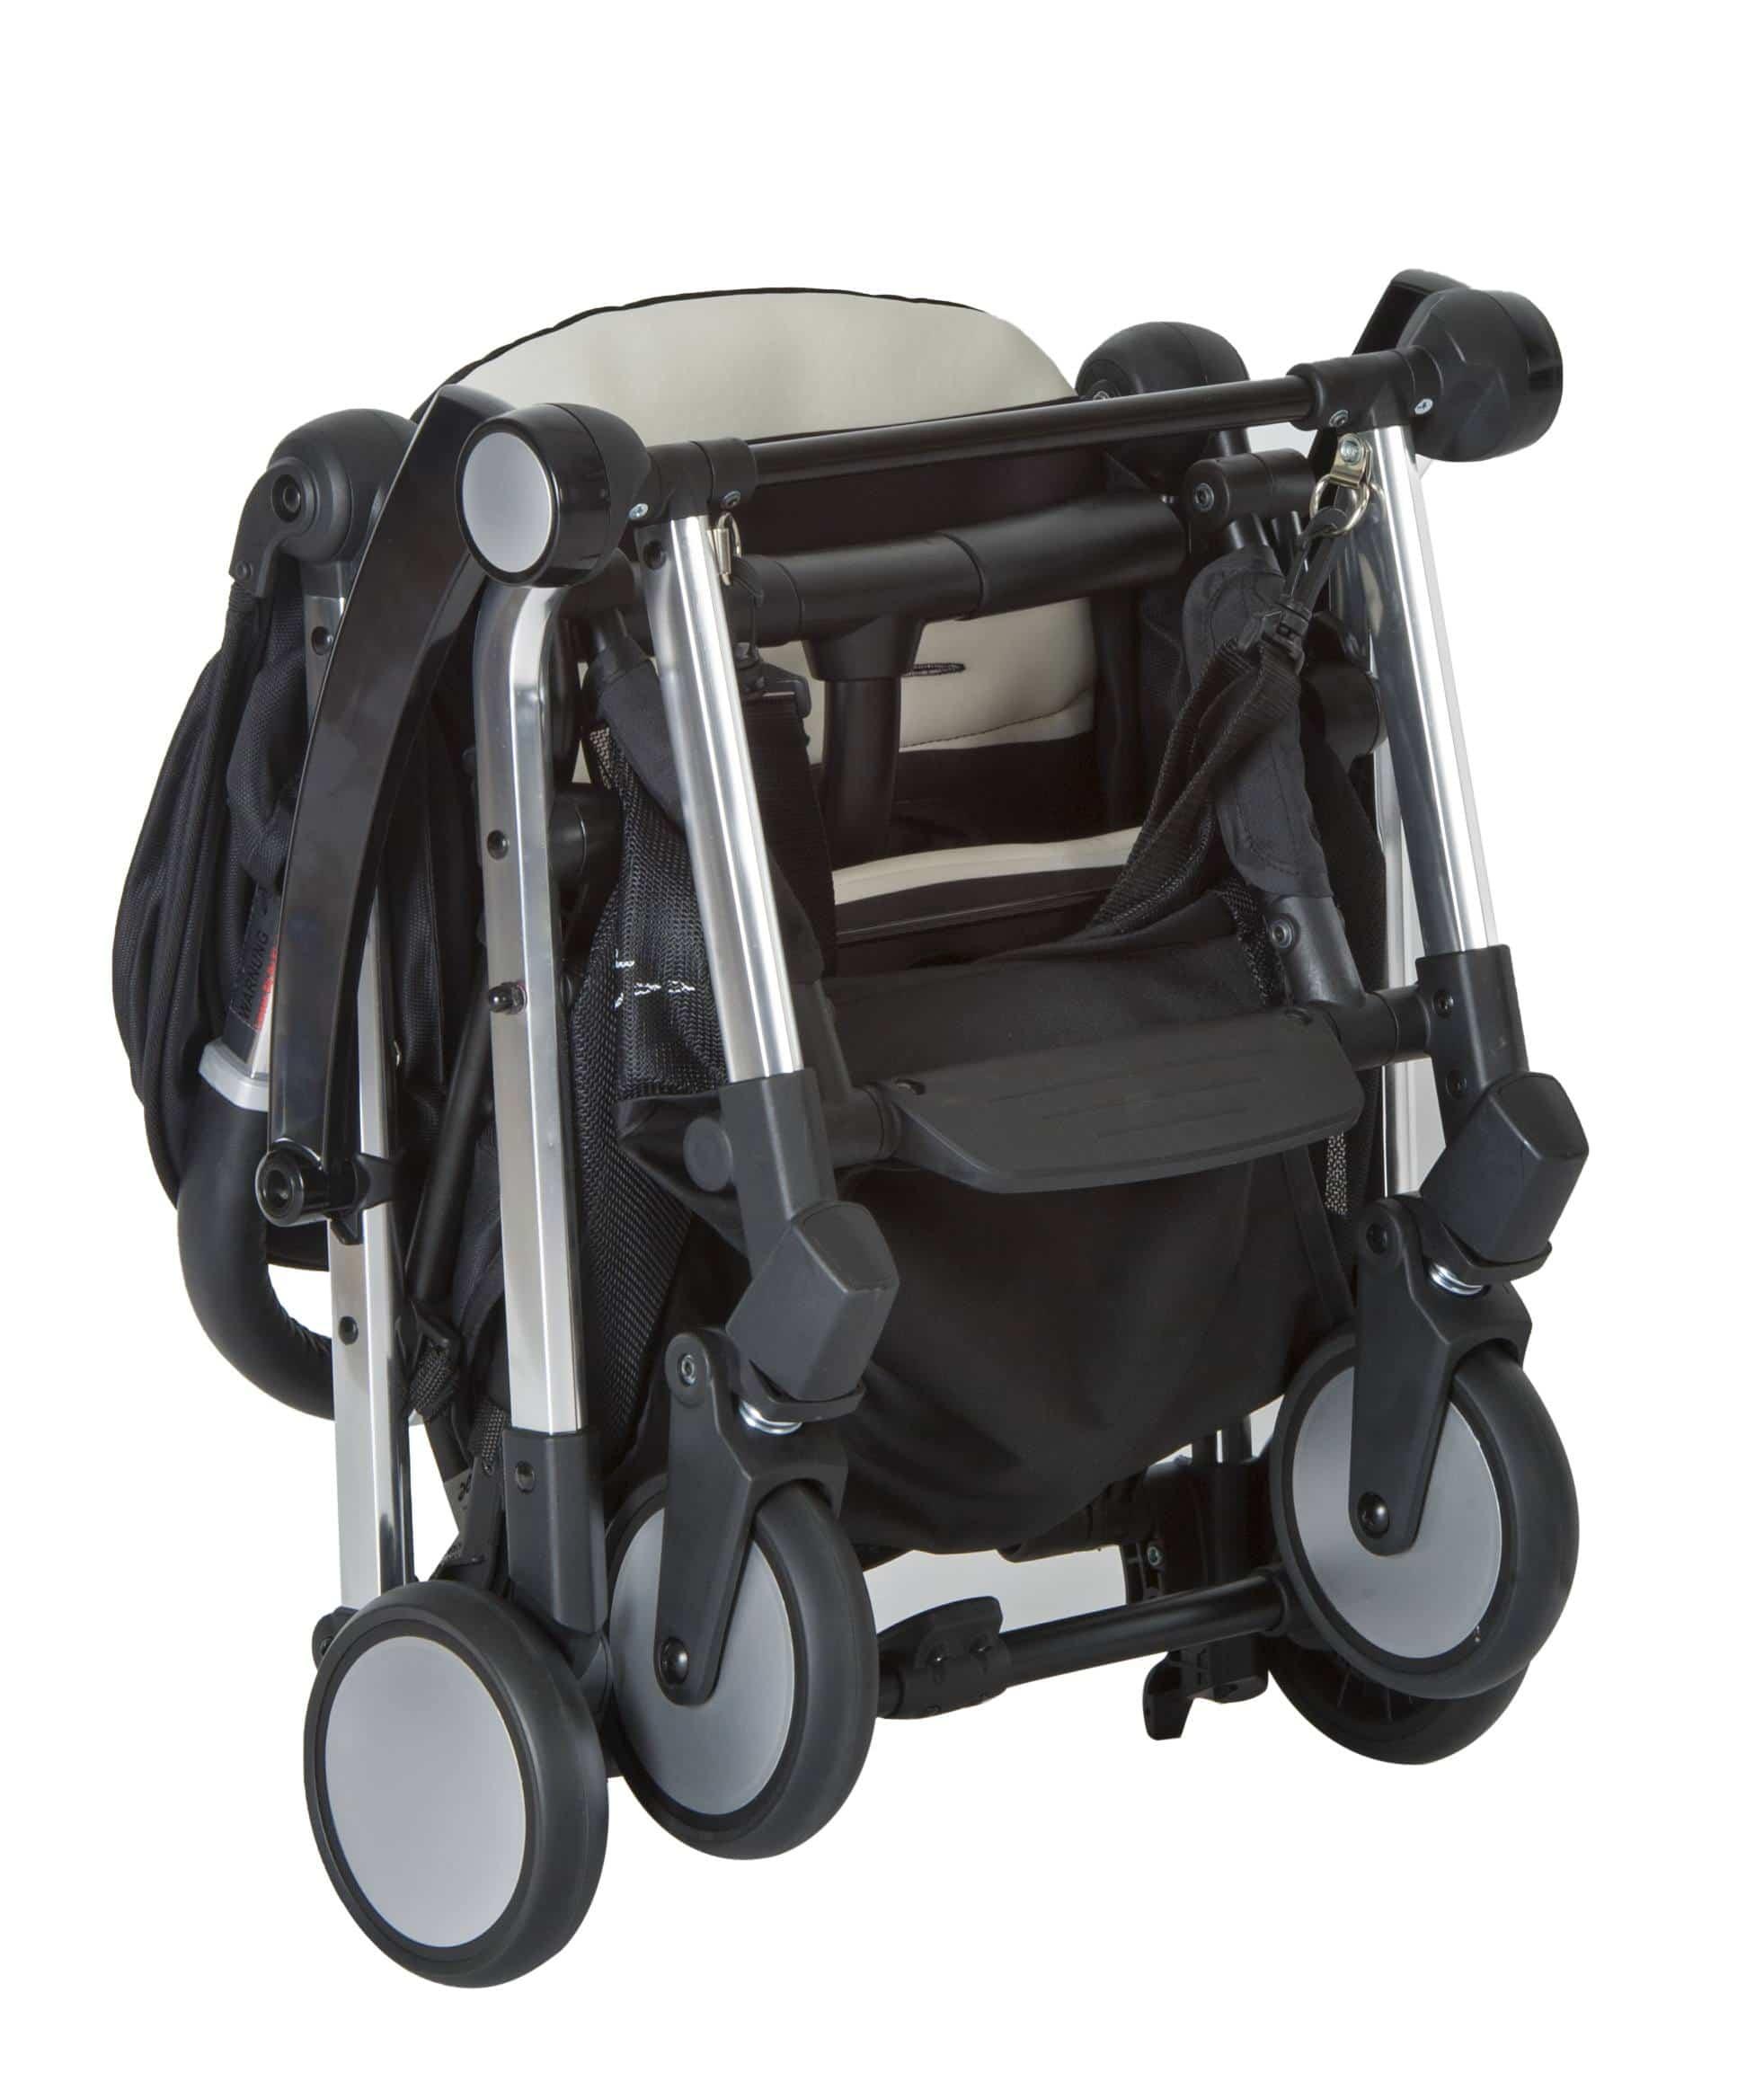 Bit stroller folded